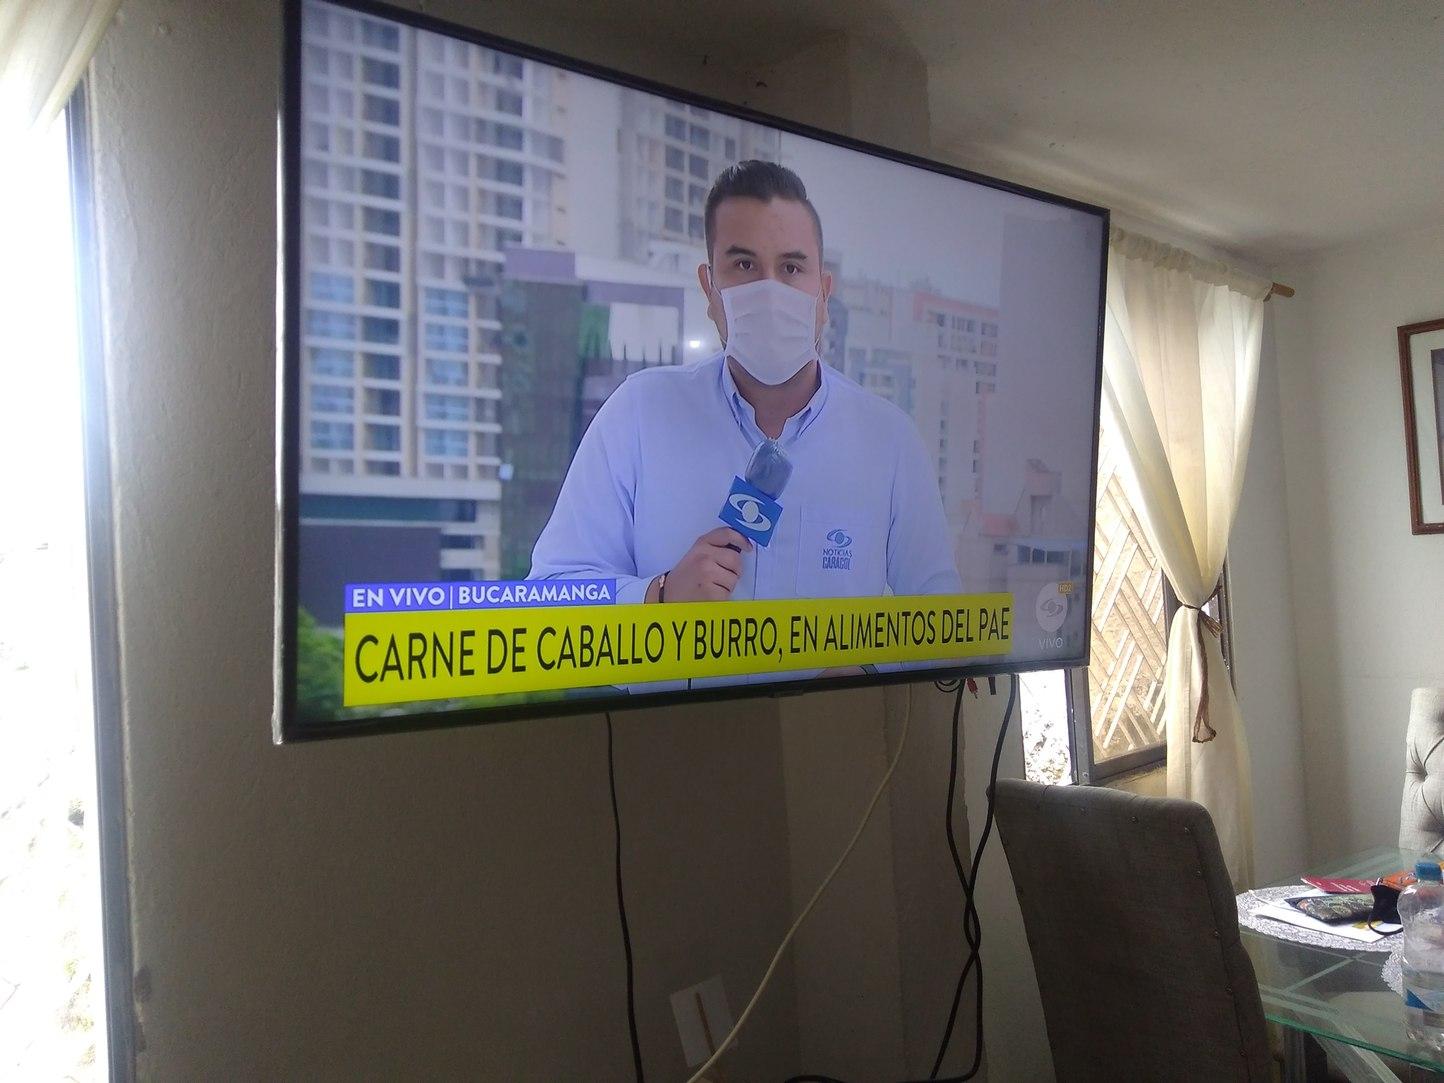 Colombia meme xD